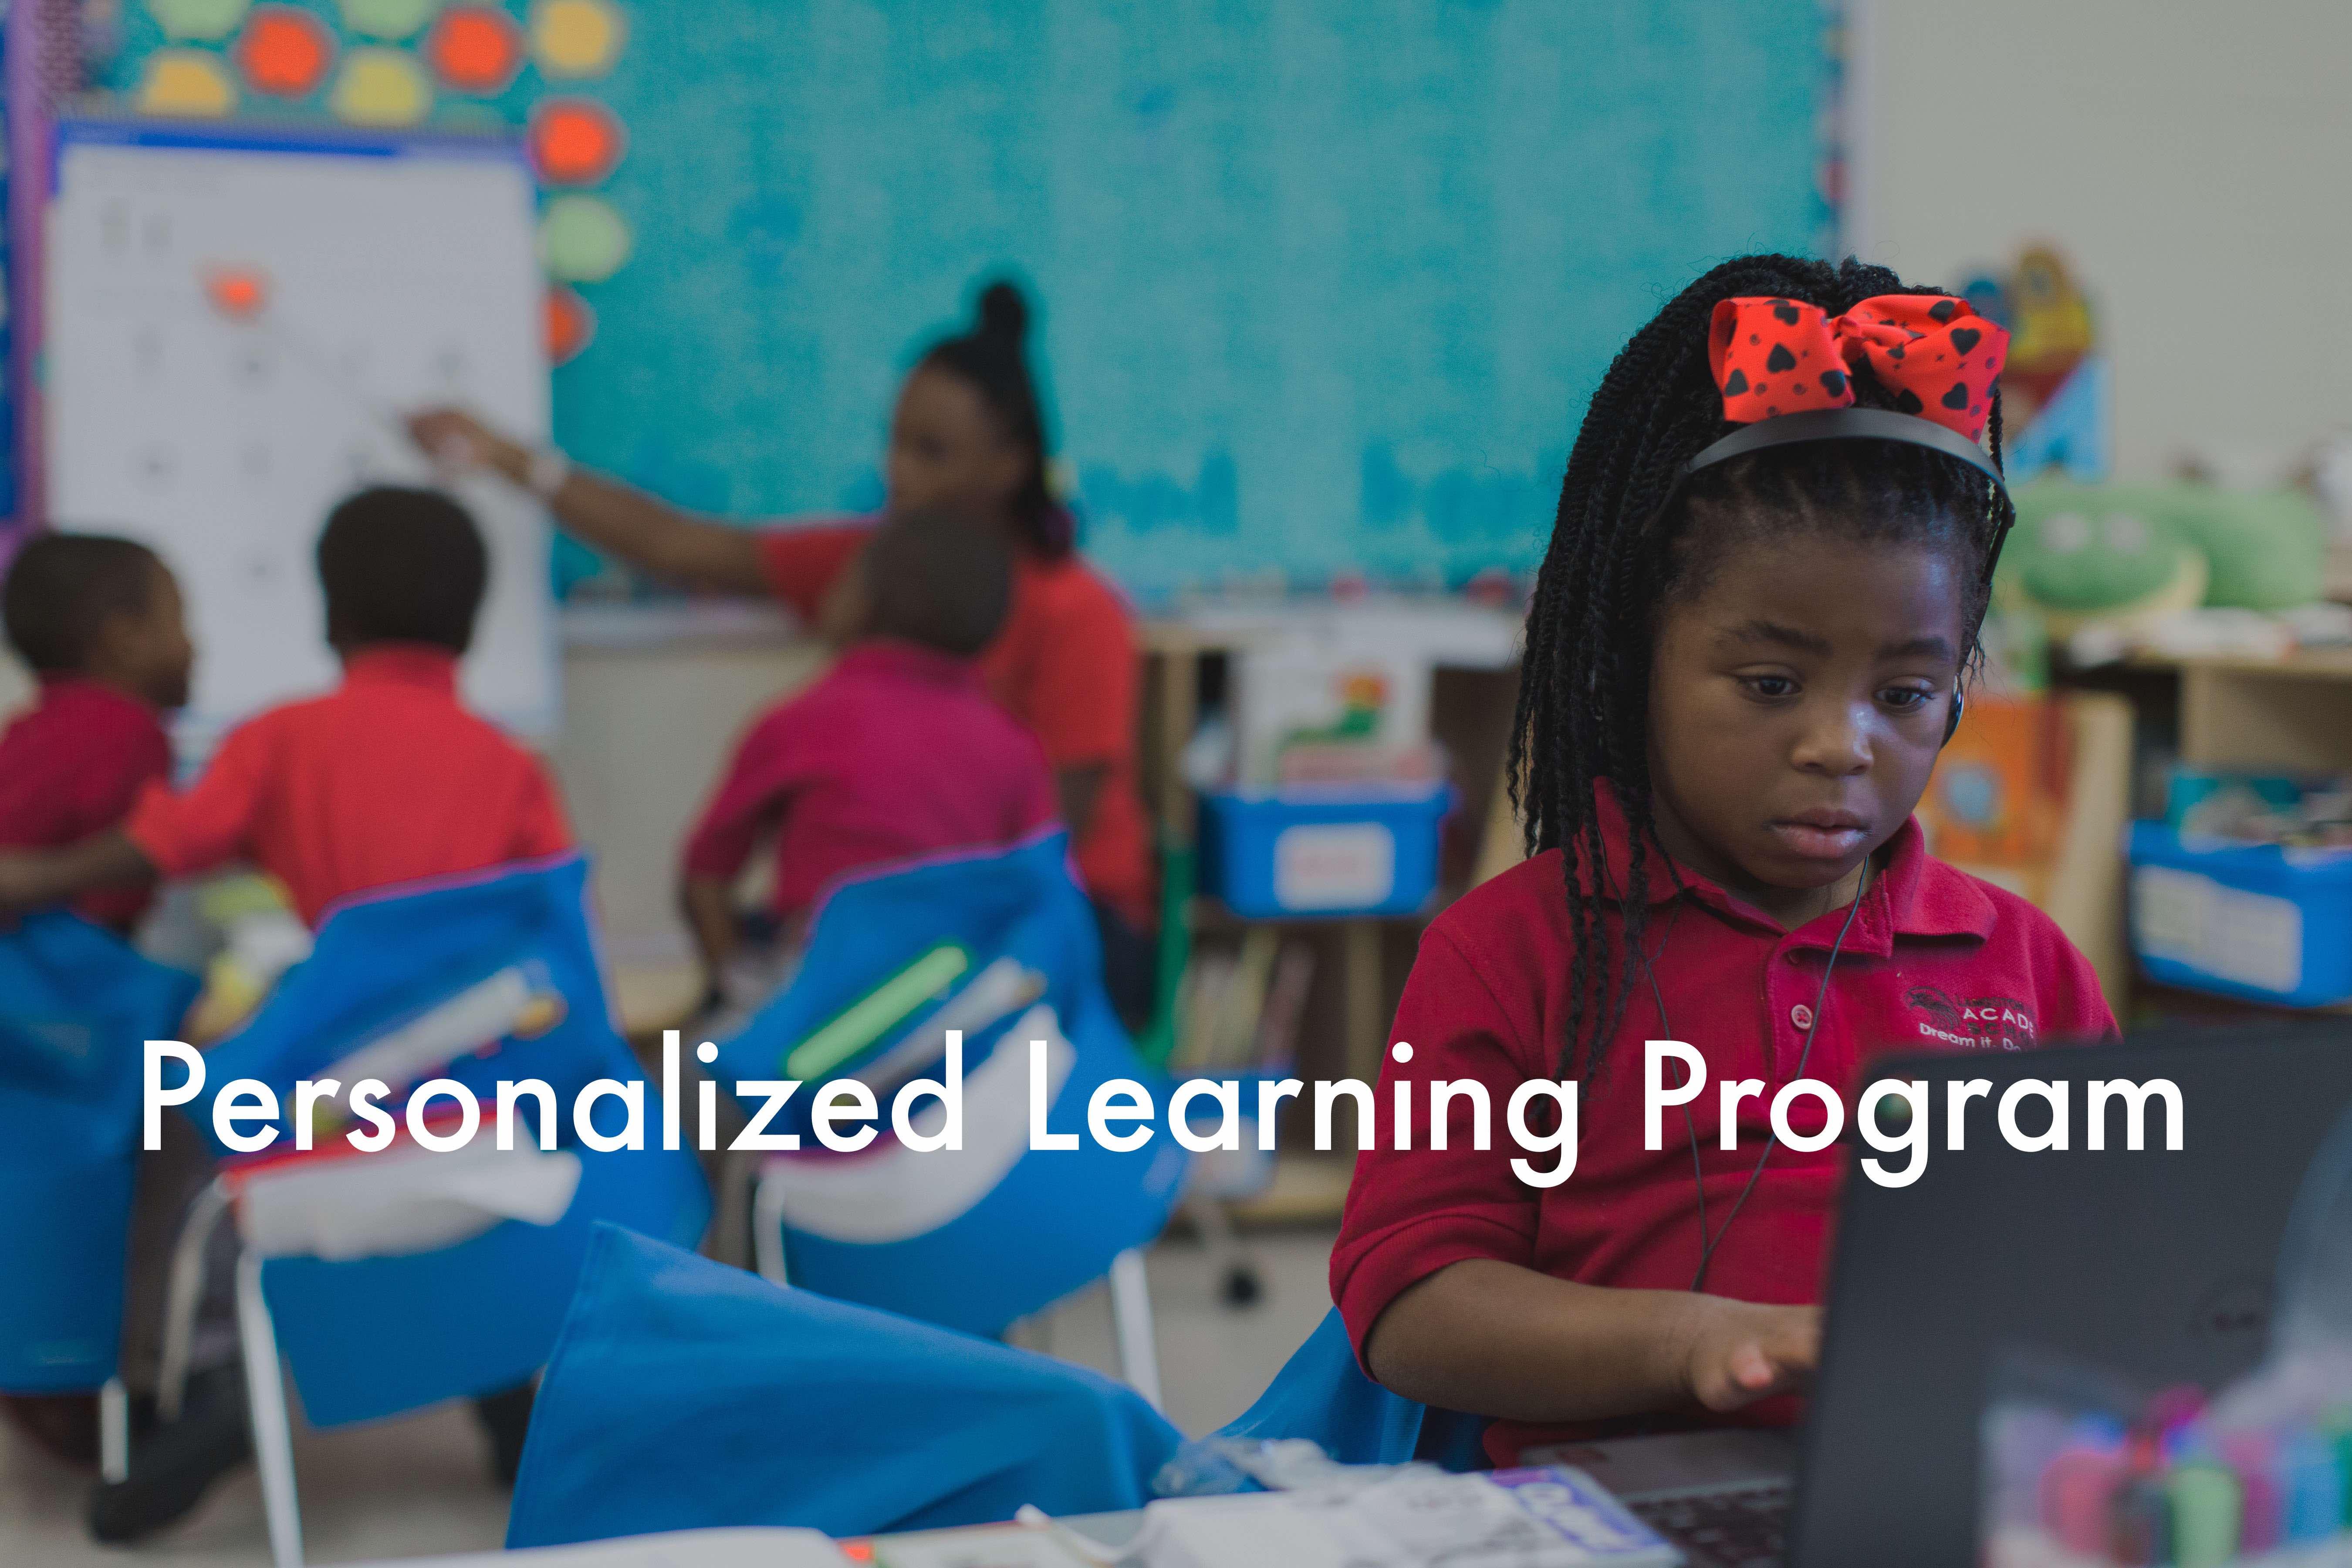 Personalized Learning Program